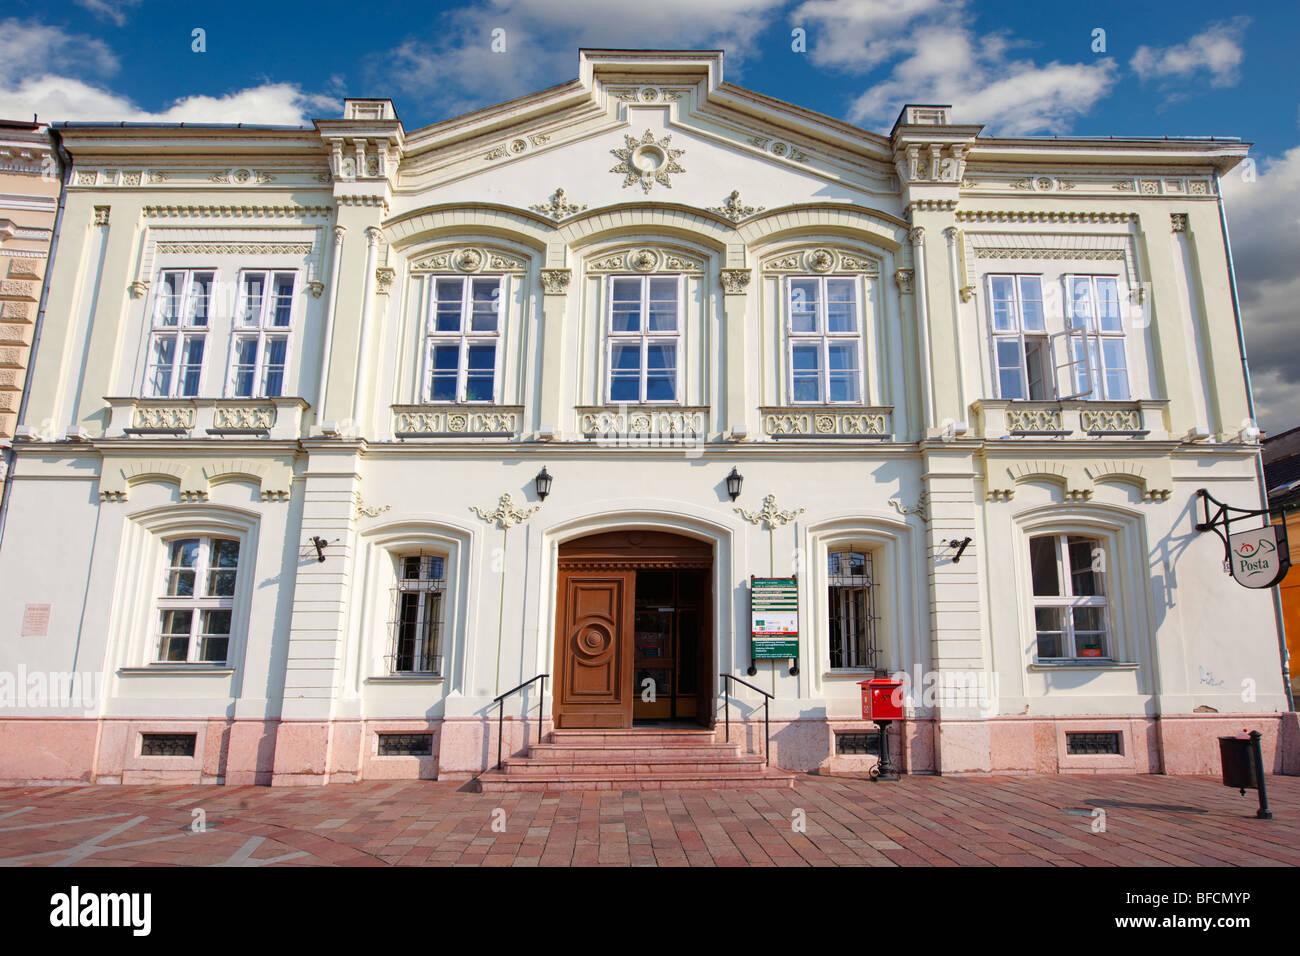 Post Office - Bischitzky - Muller Haz - 1863 Romantic style building. Esztergom, Hungary - Stock Image